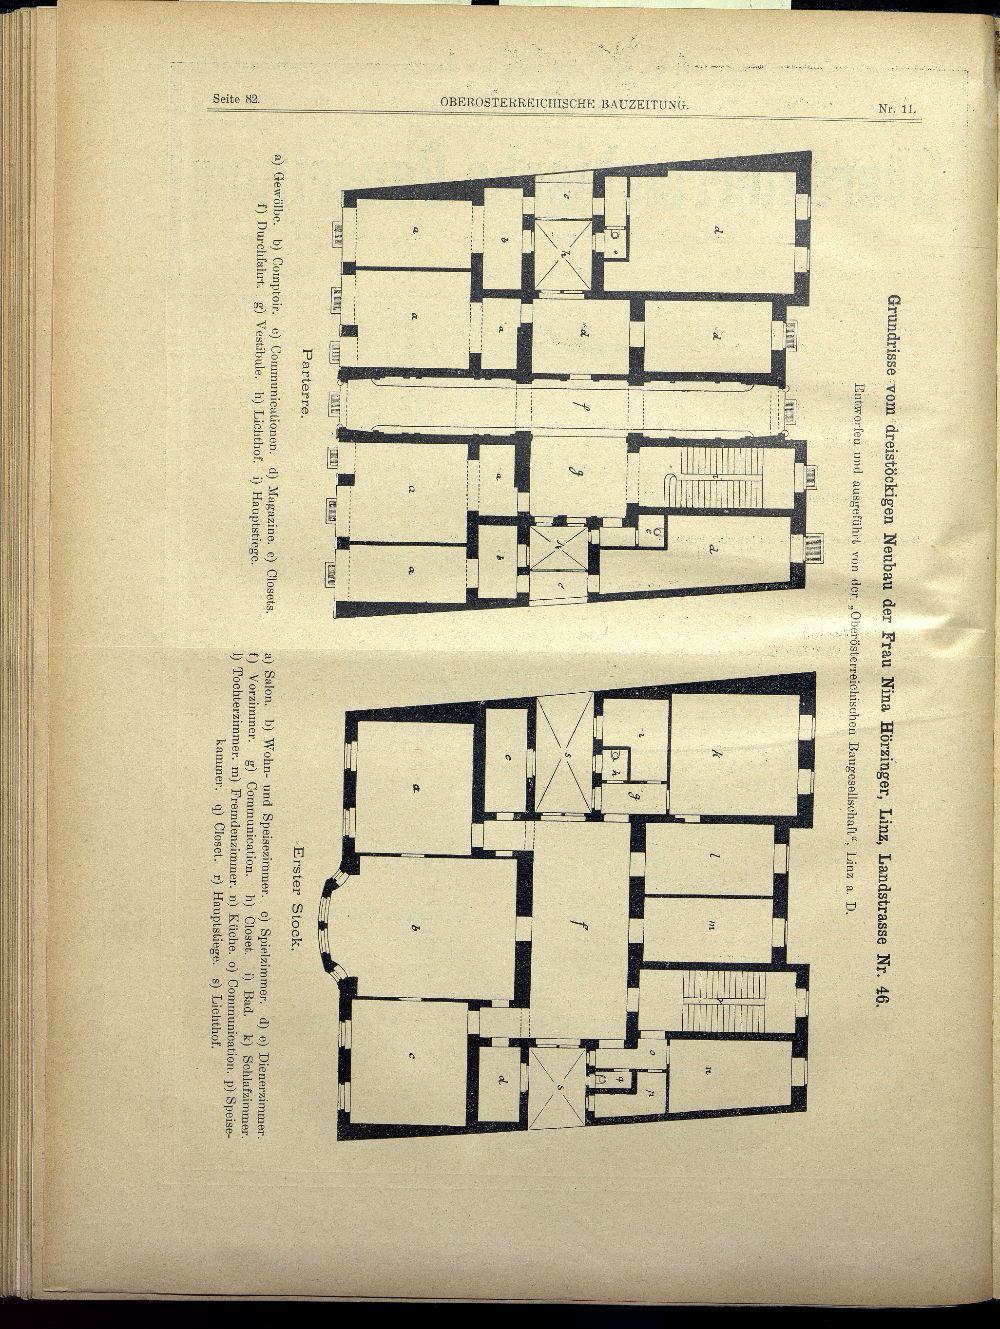 Berühmt Dampfkessel Wohn Fotos - Schaltplan Serie Circuit Collection ...